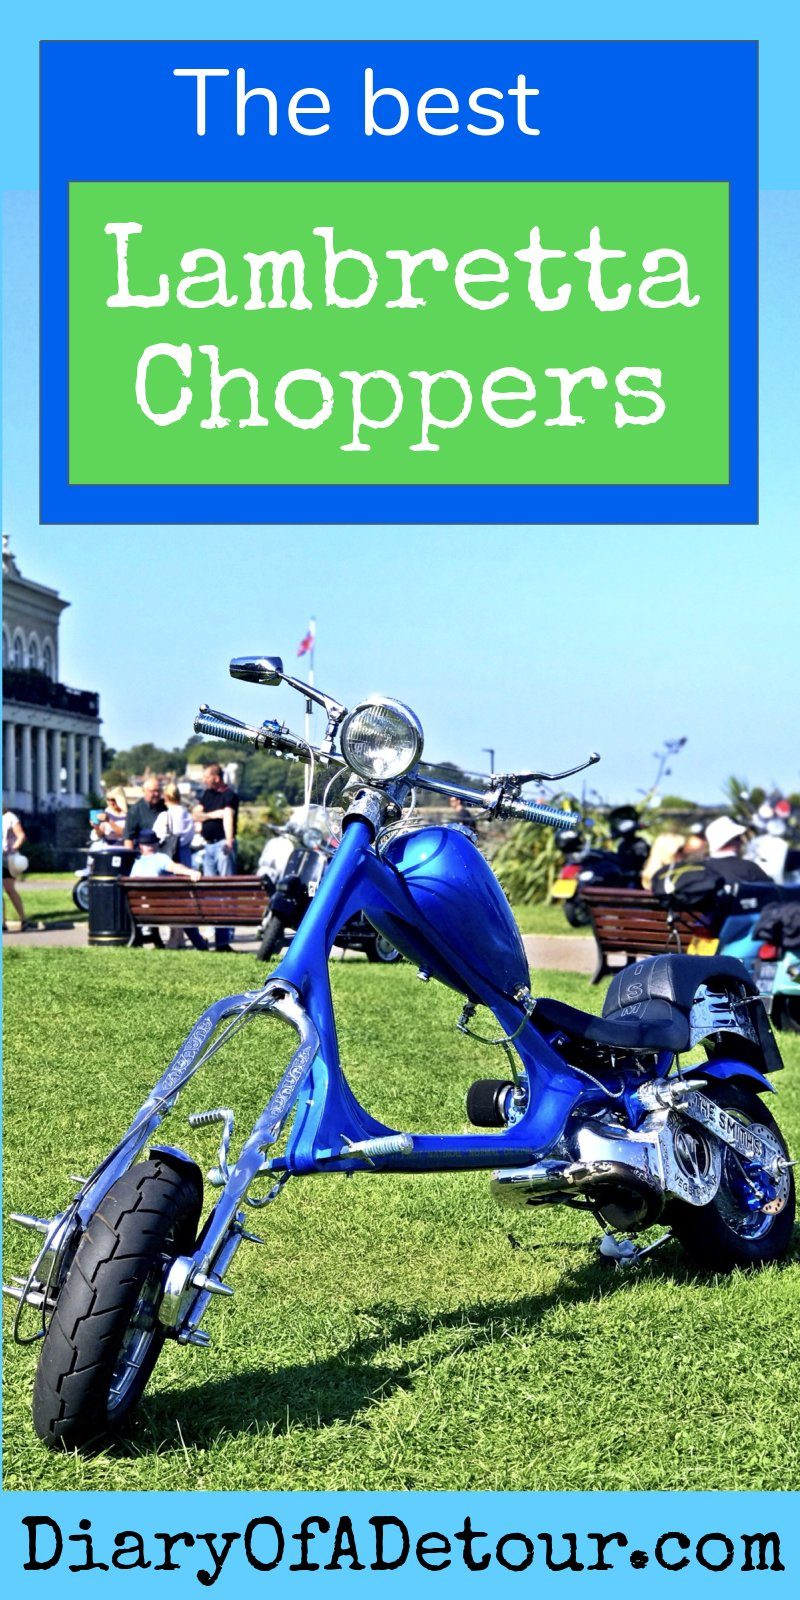 Lambretta Choppers : the most radical Lambretta scooter choppers